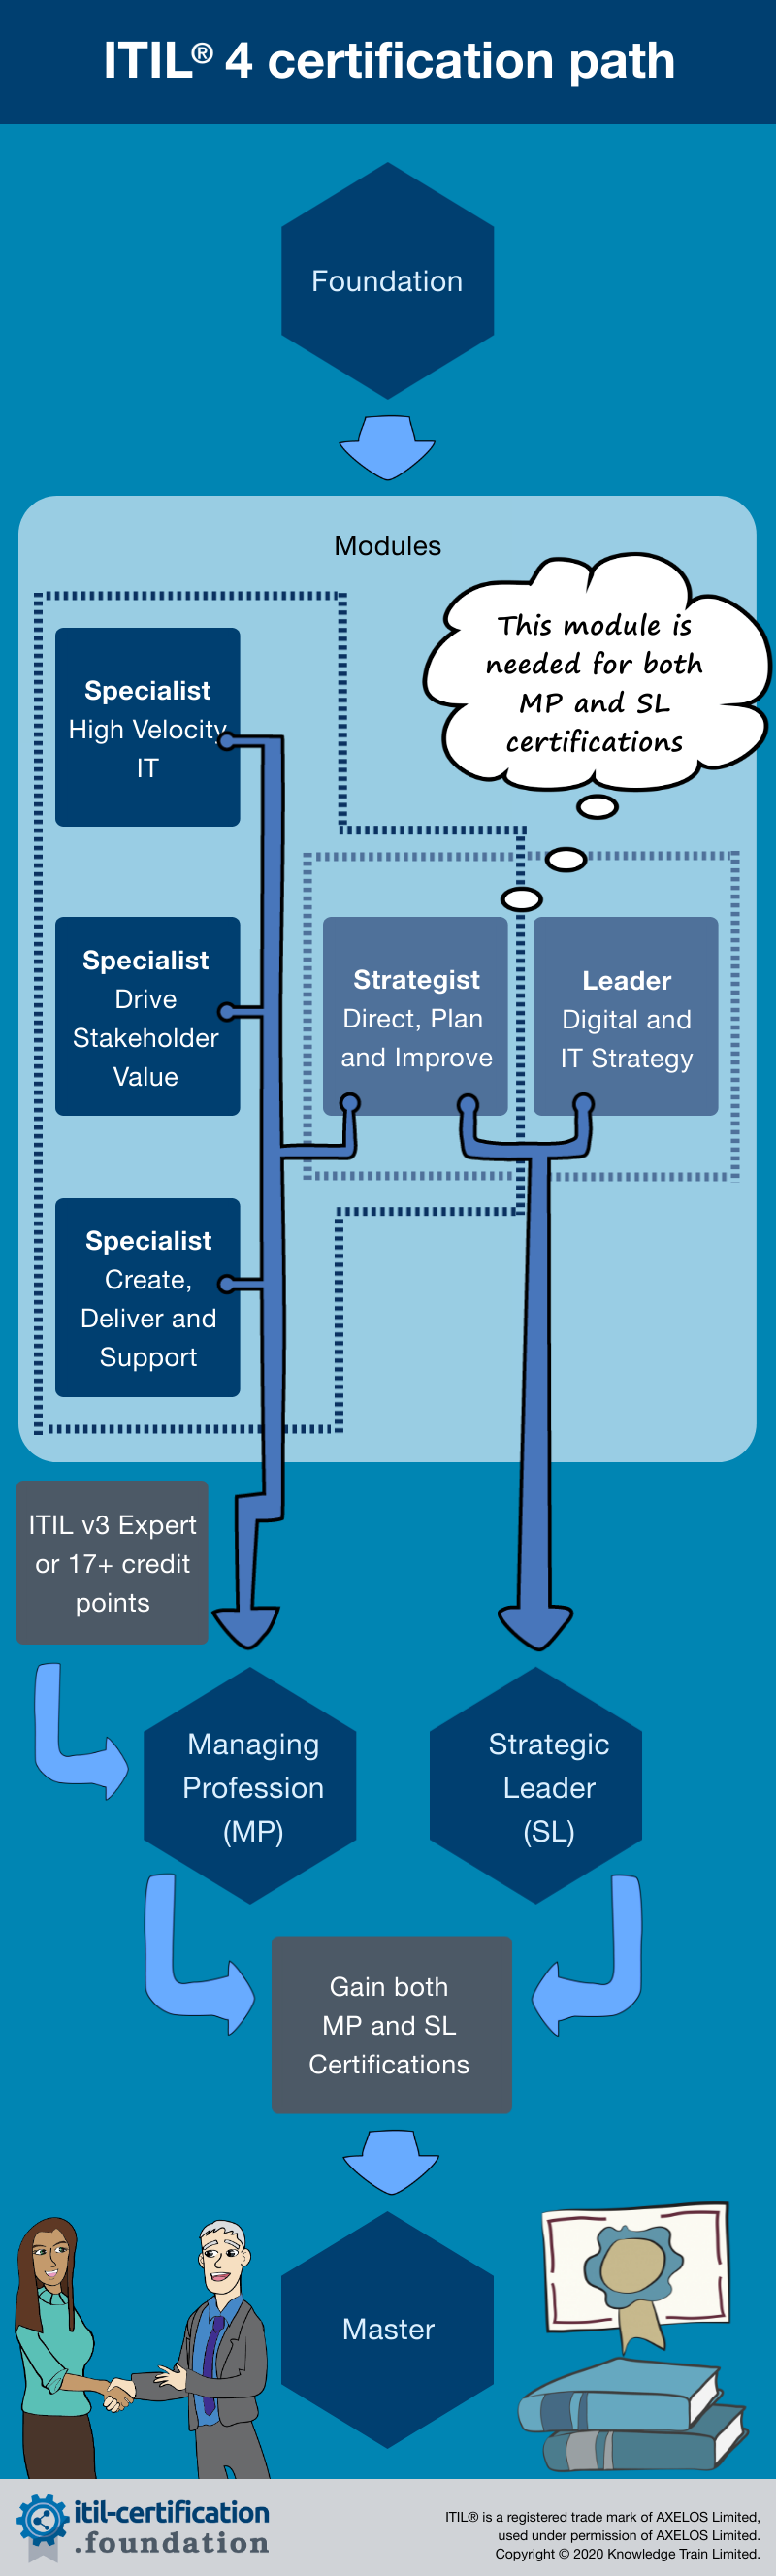 ITIL v3 certification path